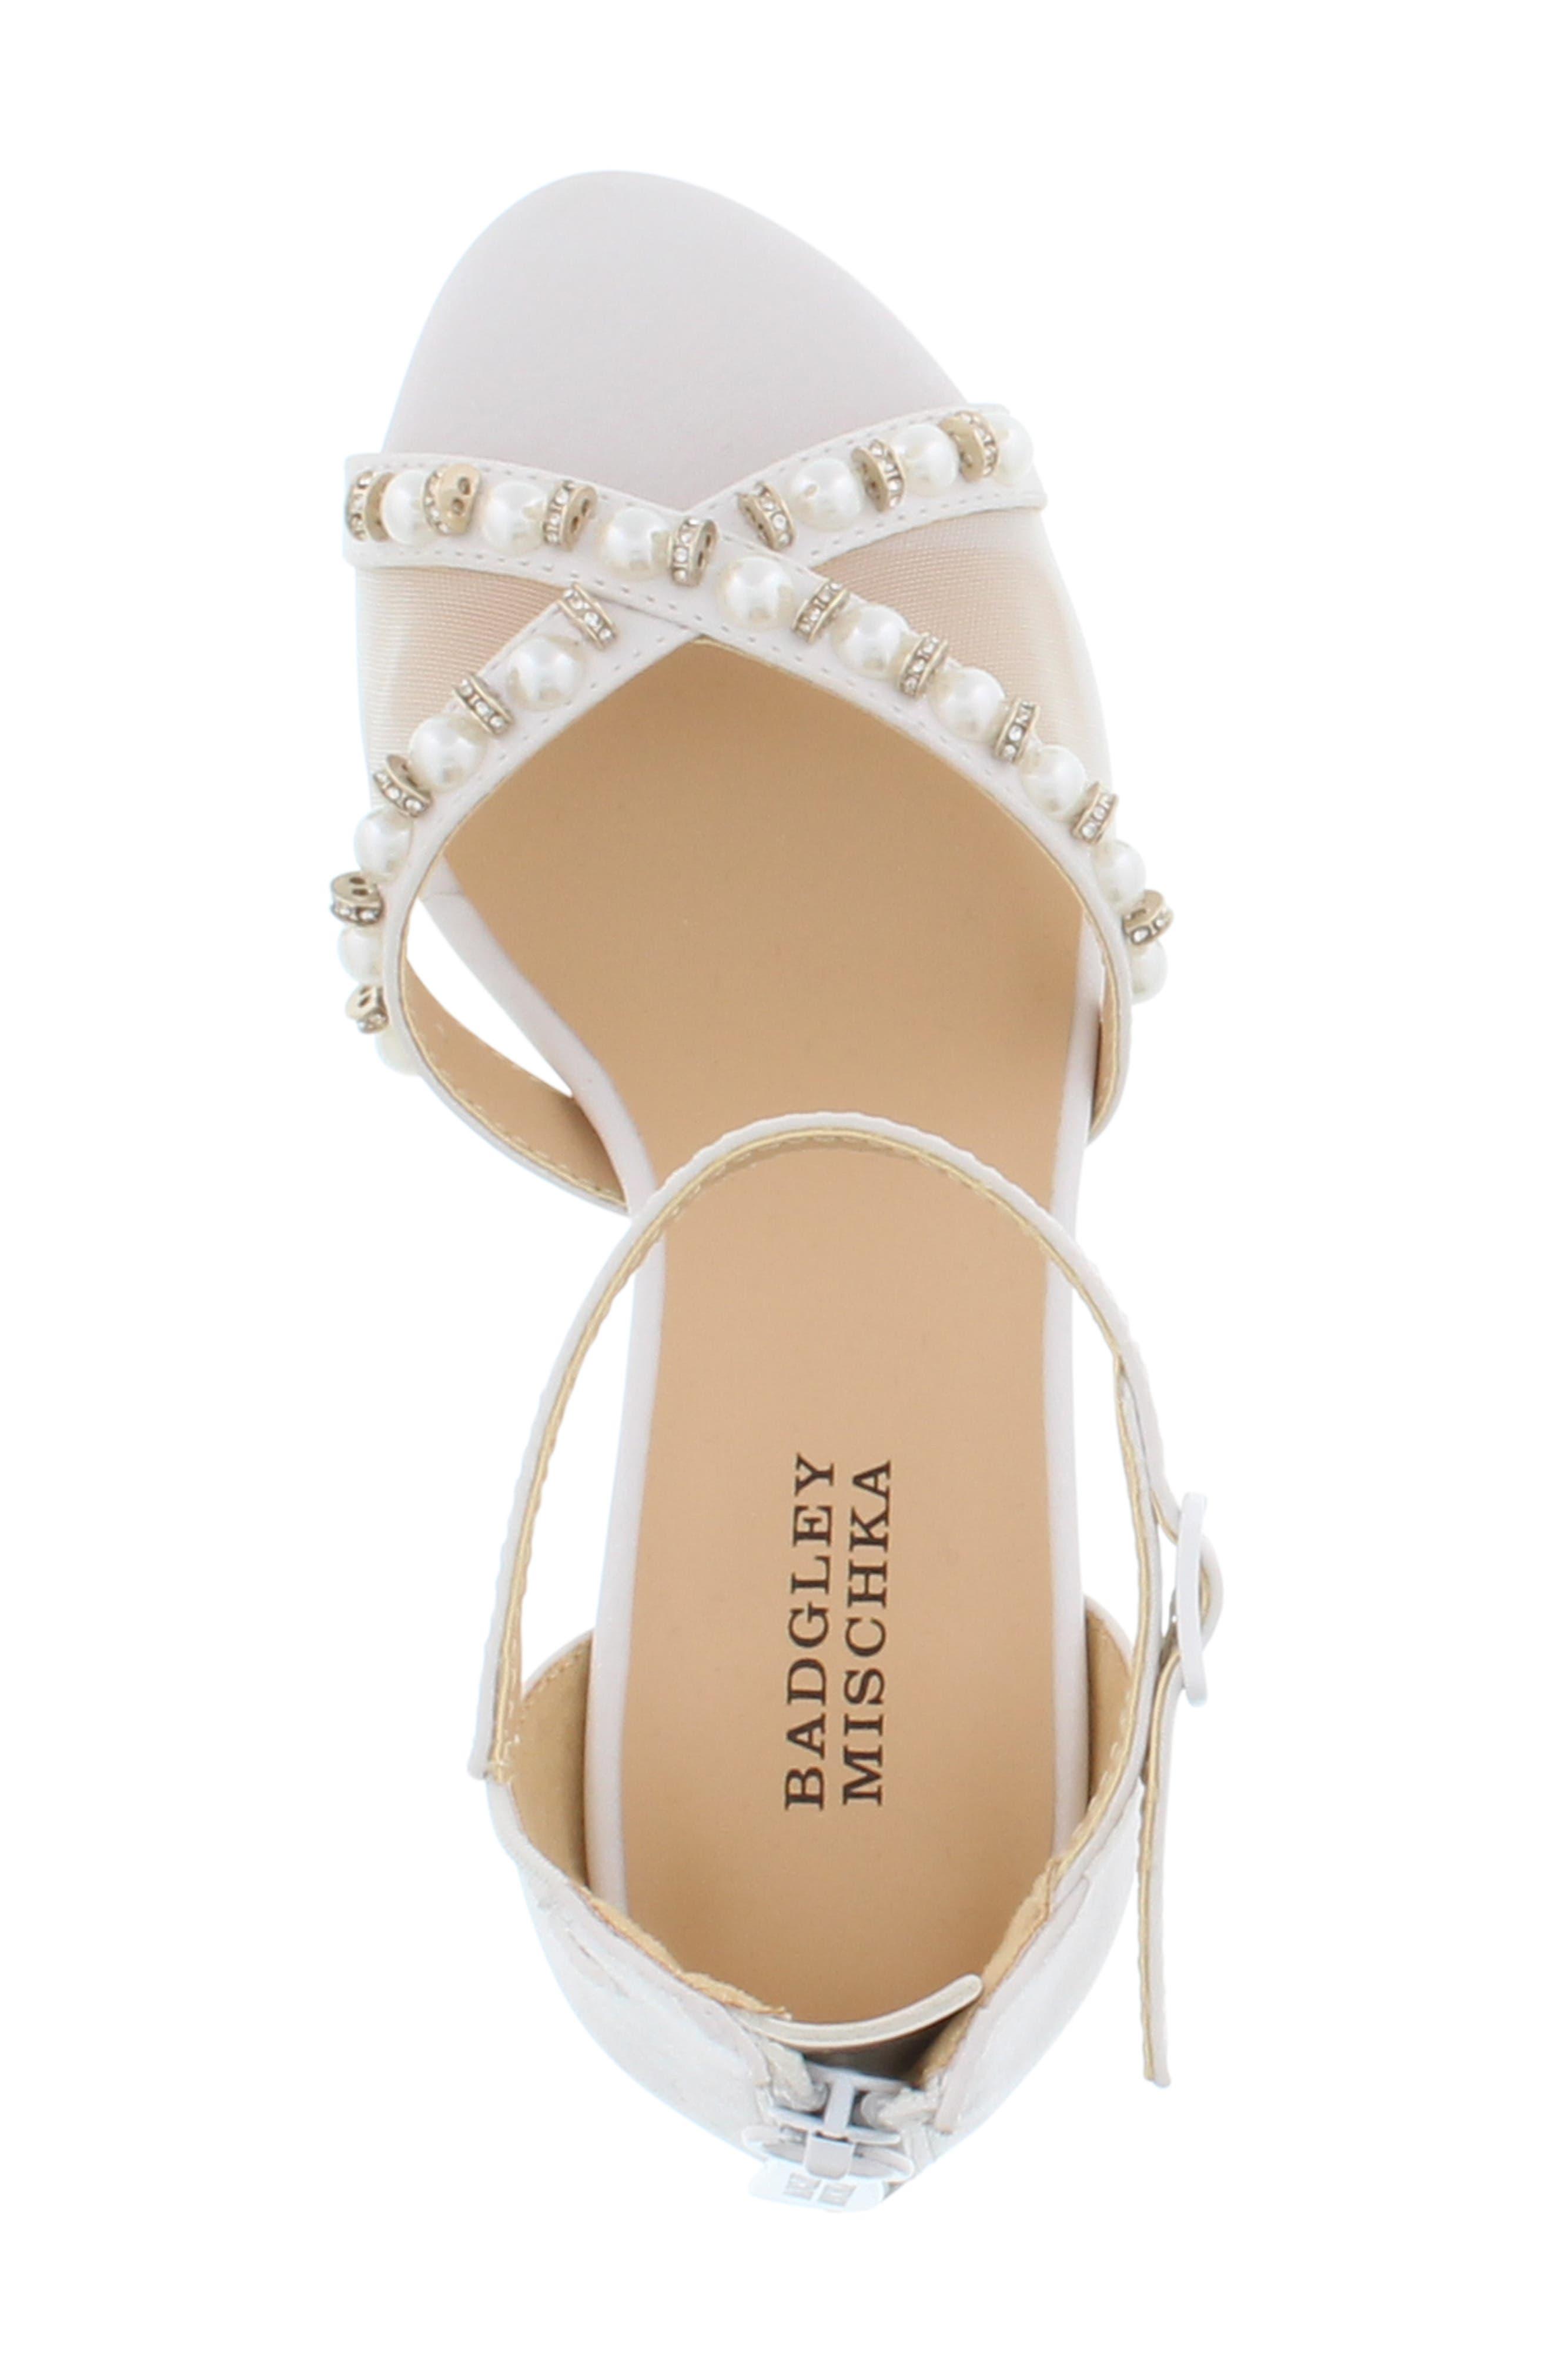 BADGLEY MISCHKA COLLECTION,                             Badgley Mischka Pernia Emily Embellished Sandal,                             Alternate thumbnail 4, color,                             WHITE SHIMMER